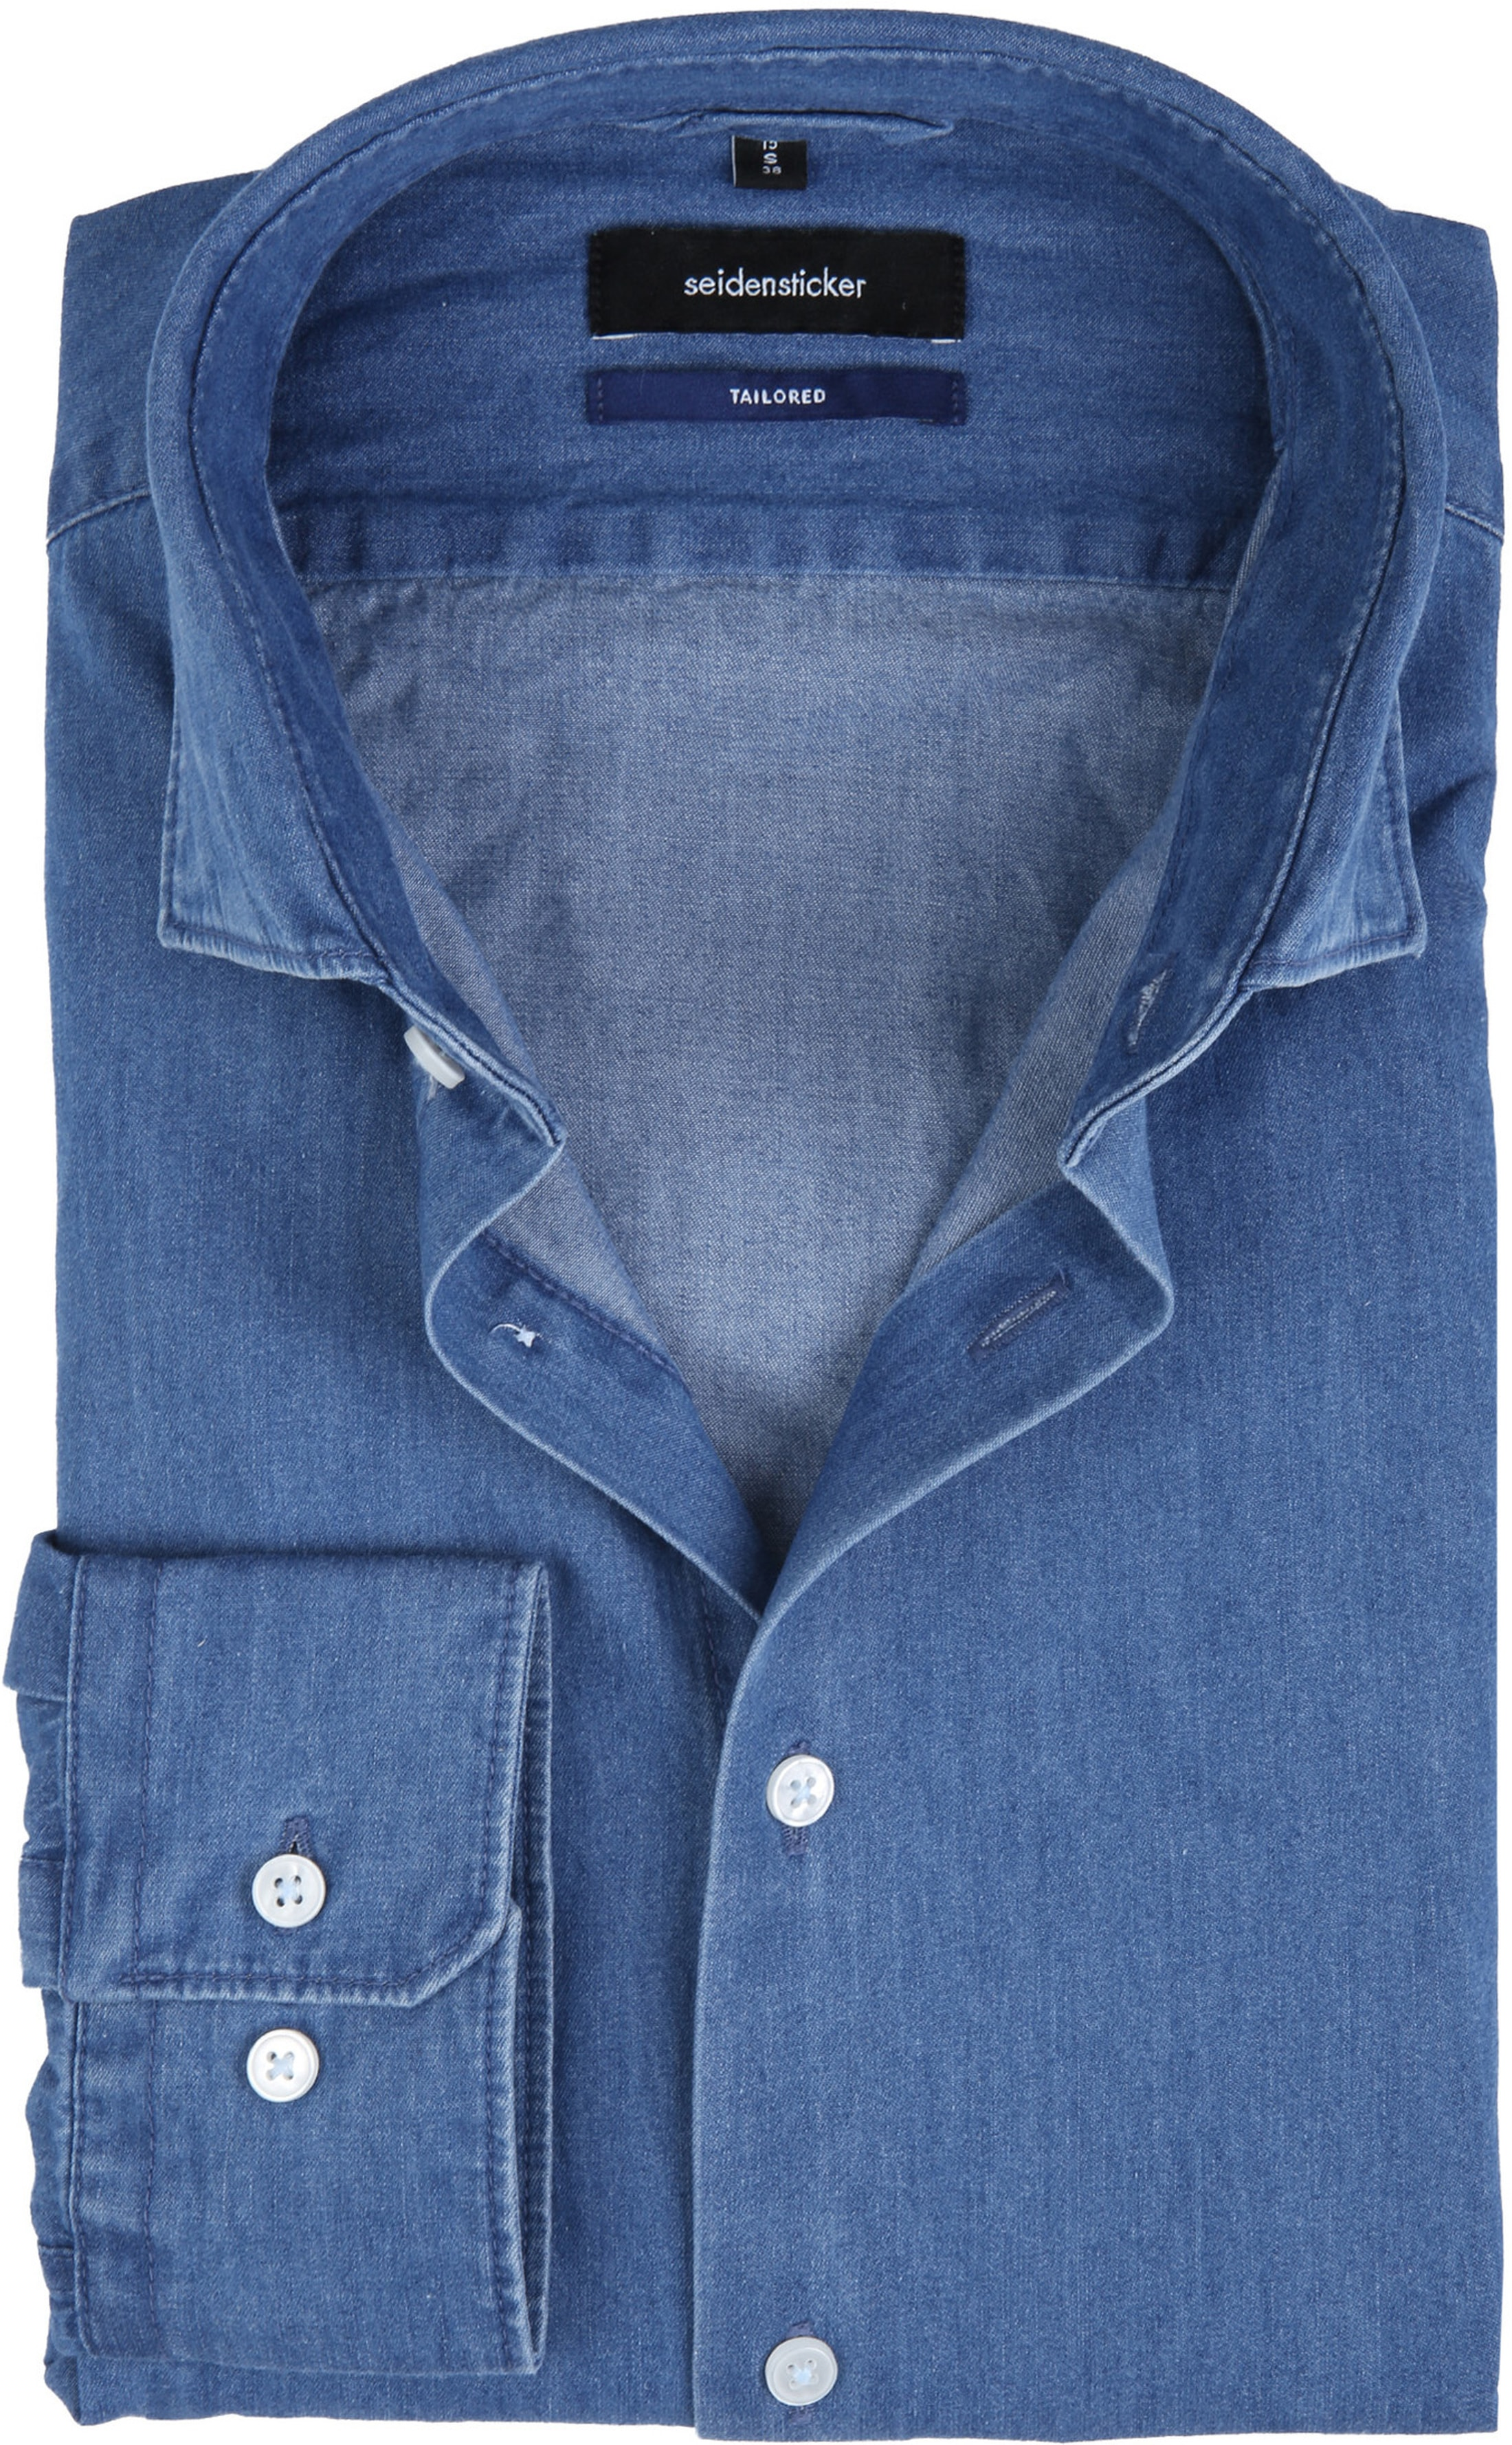 Seidensticker Overhemd TF Denim Blue foto 0